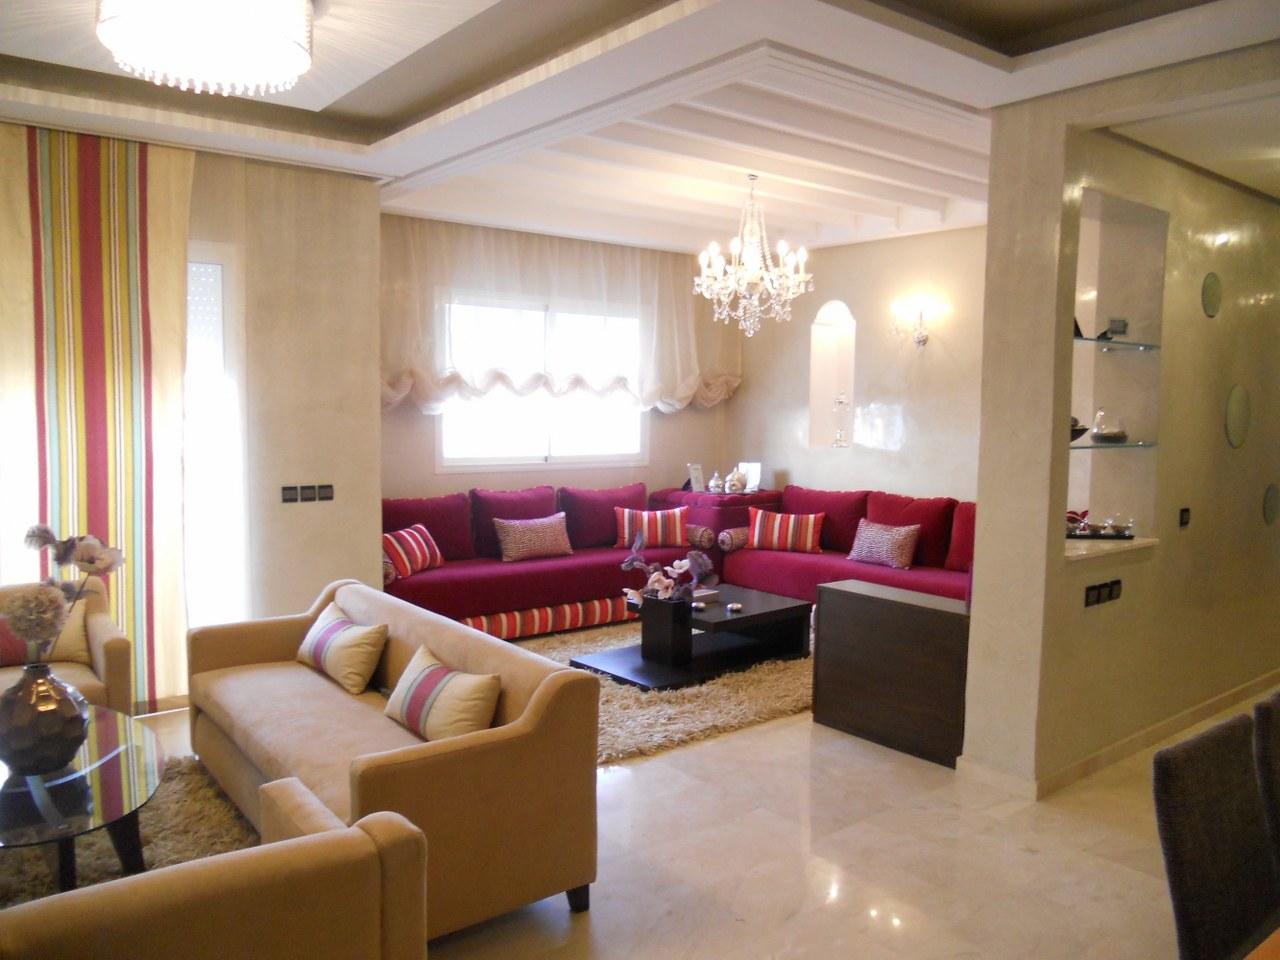 une offre immobili re casablancaise diversifi e guide immobilier maroc immobilier marrakech. Black Bedroom Furniture Sets. Home Design Ideas